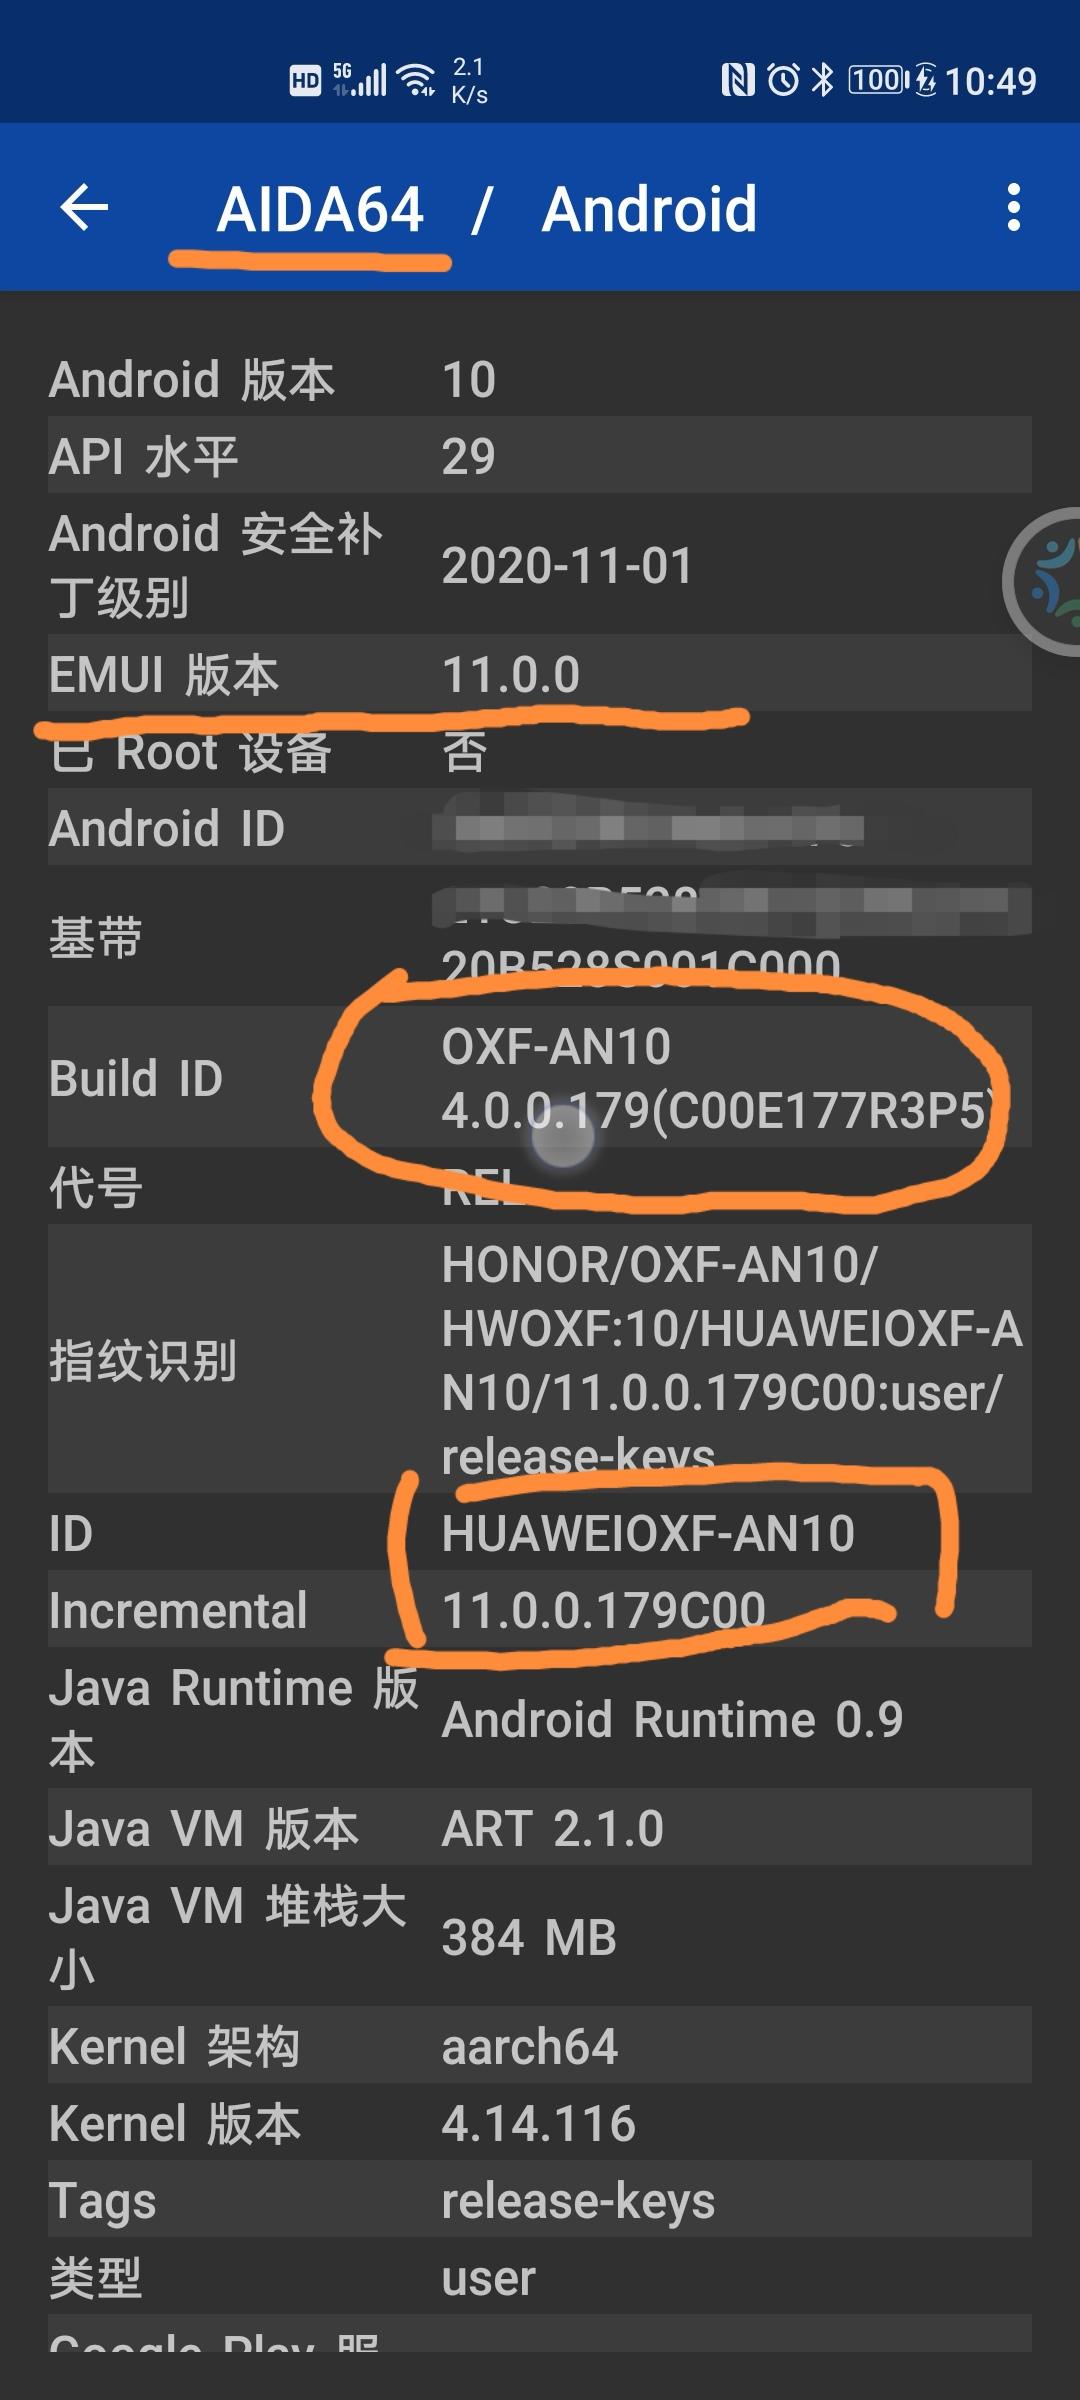 Screenshot_20210515_104918_com.finalwire.aida64_edit_38193400128546.jpg